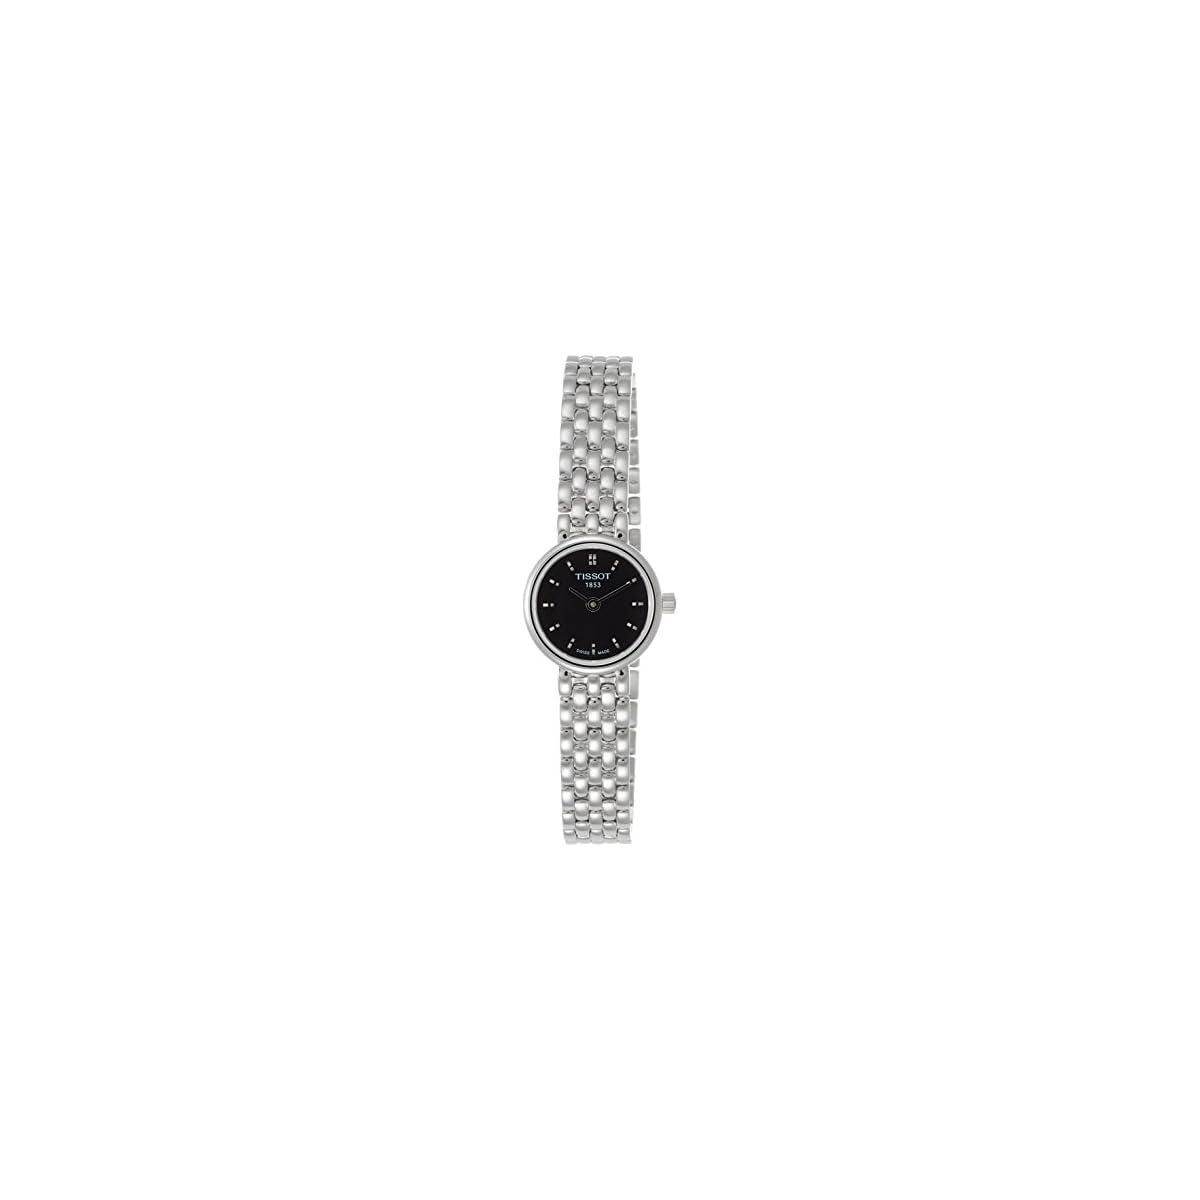 41P3tmxR4JL. SS1200  - Tissot Lovely T0580091105100 - Reloj de Mujer de Cuarzo, Correa de Acero Inoxidable Color Plata